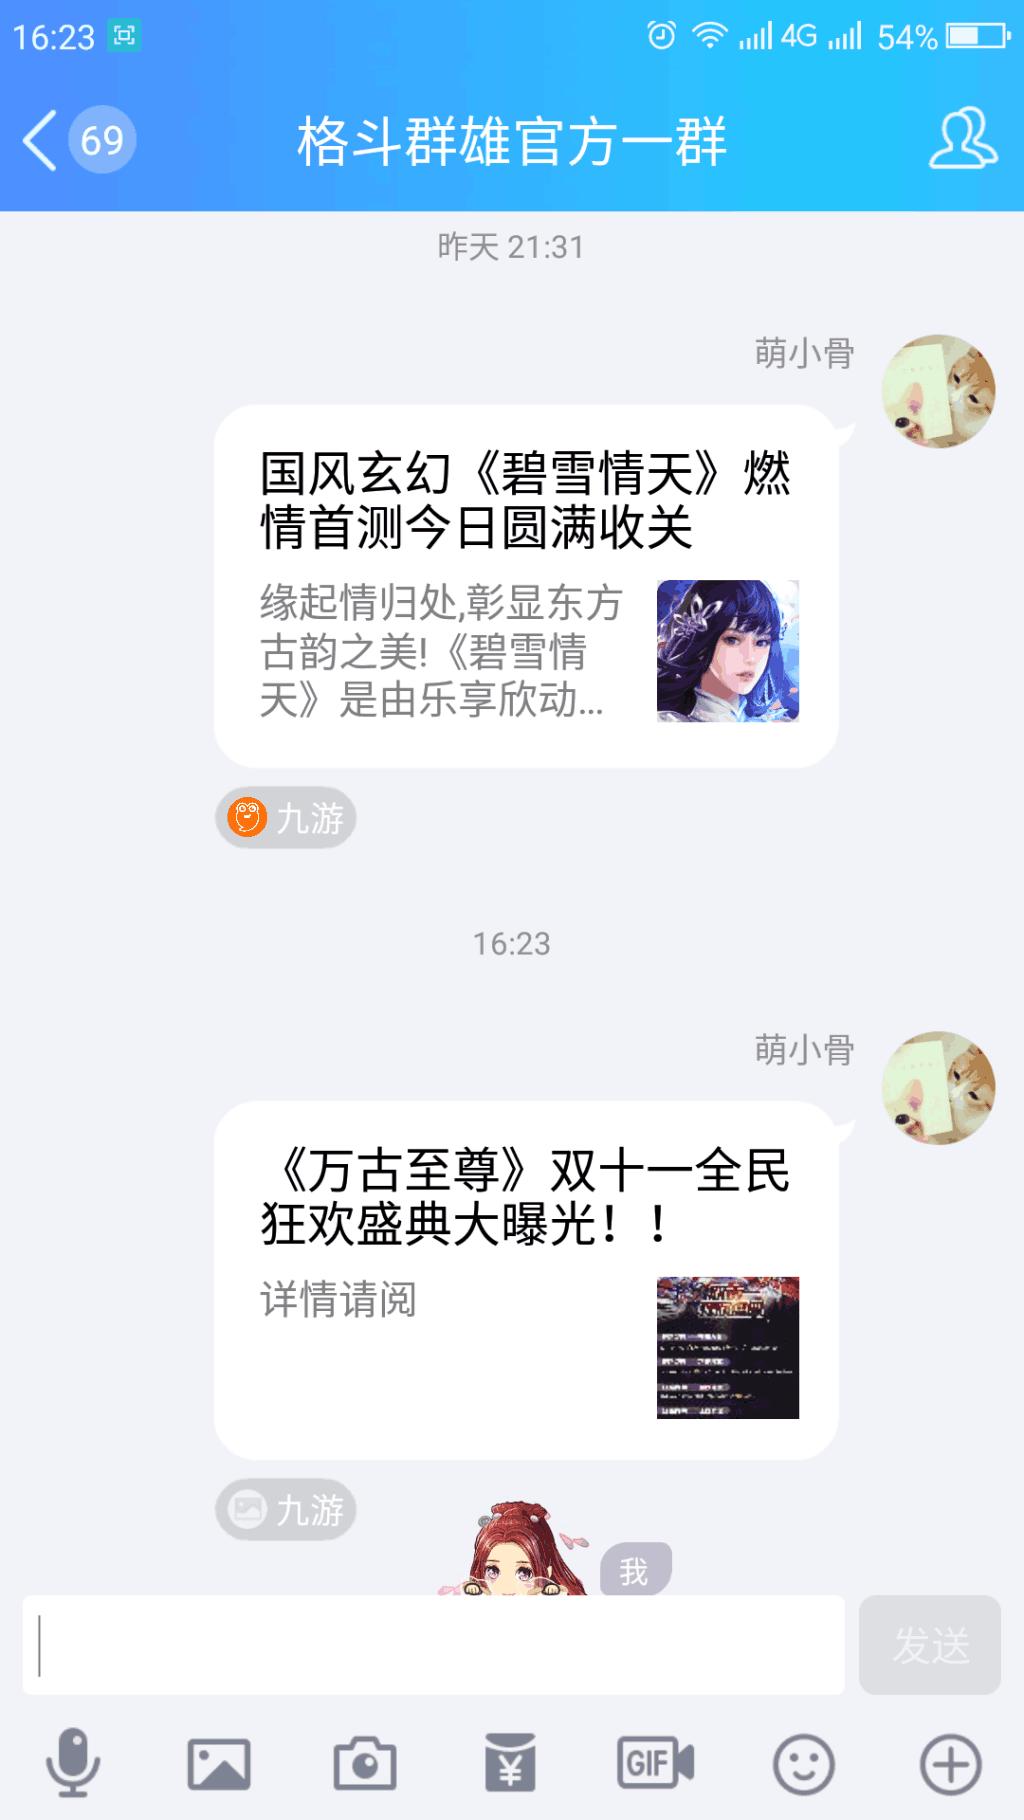 Screenshot_2018s11s11s16s23s30.png